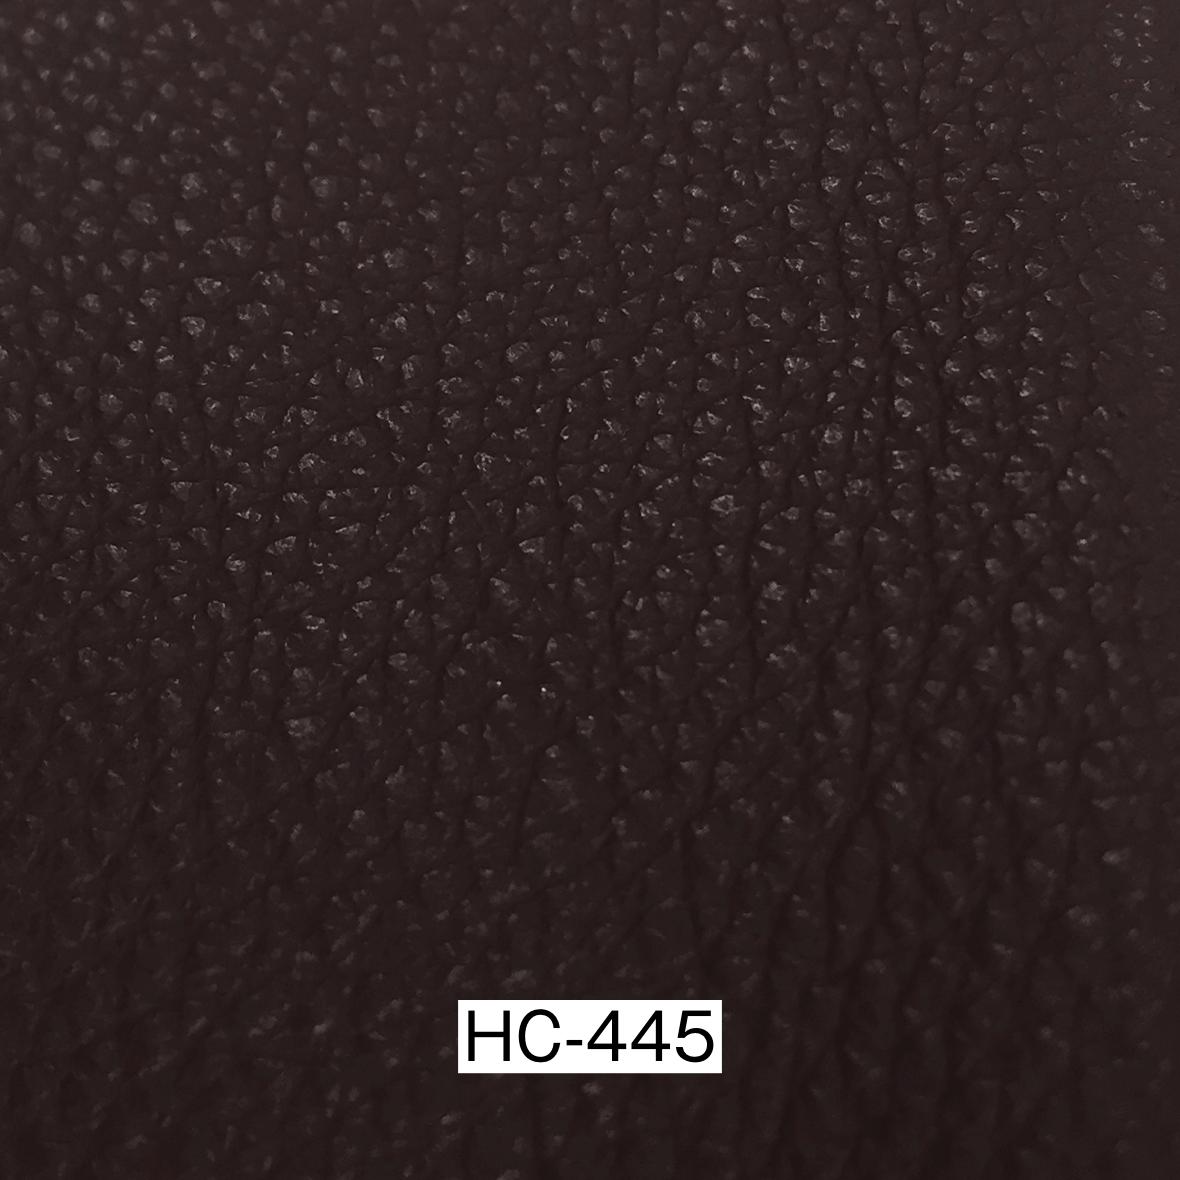 ERベイカー2 HC-445 革サンプル